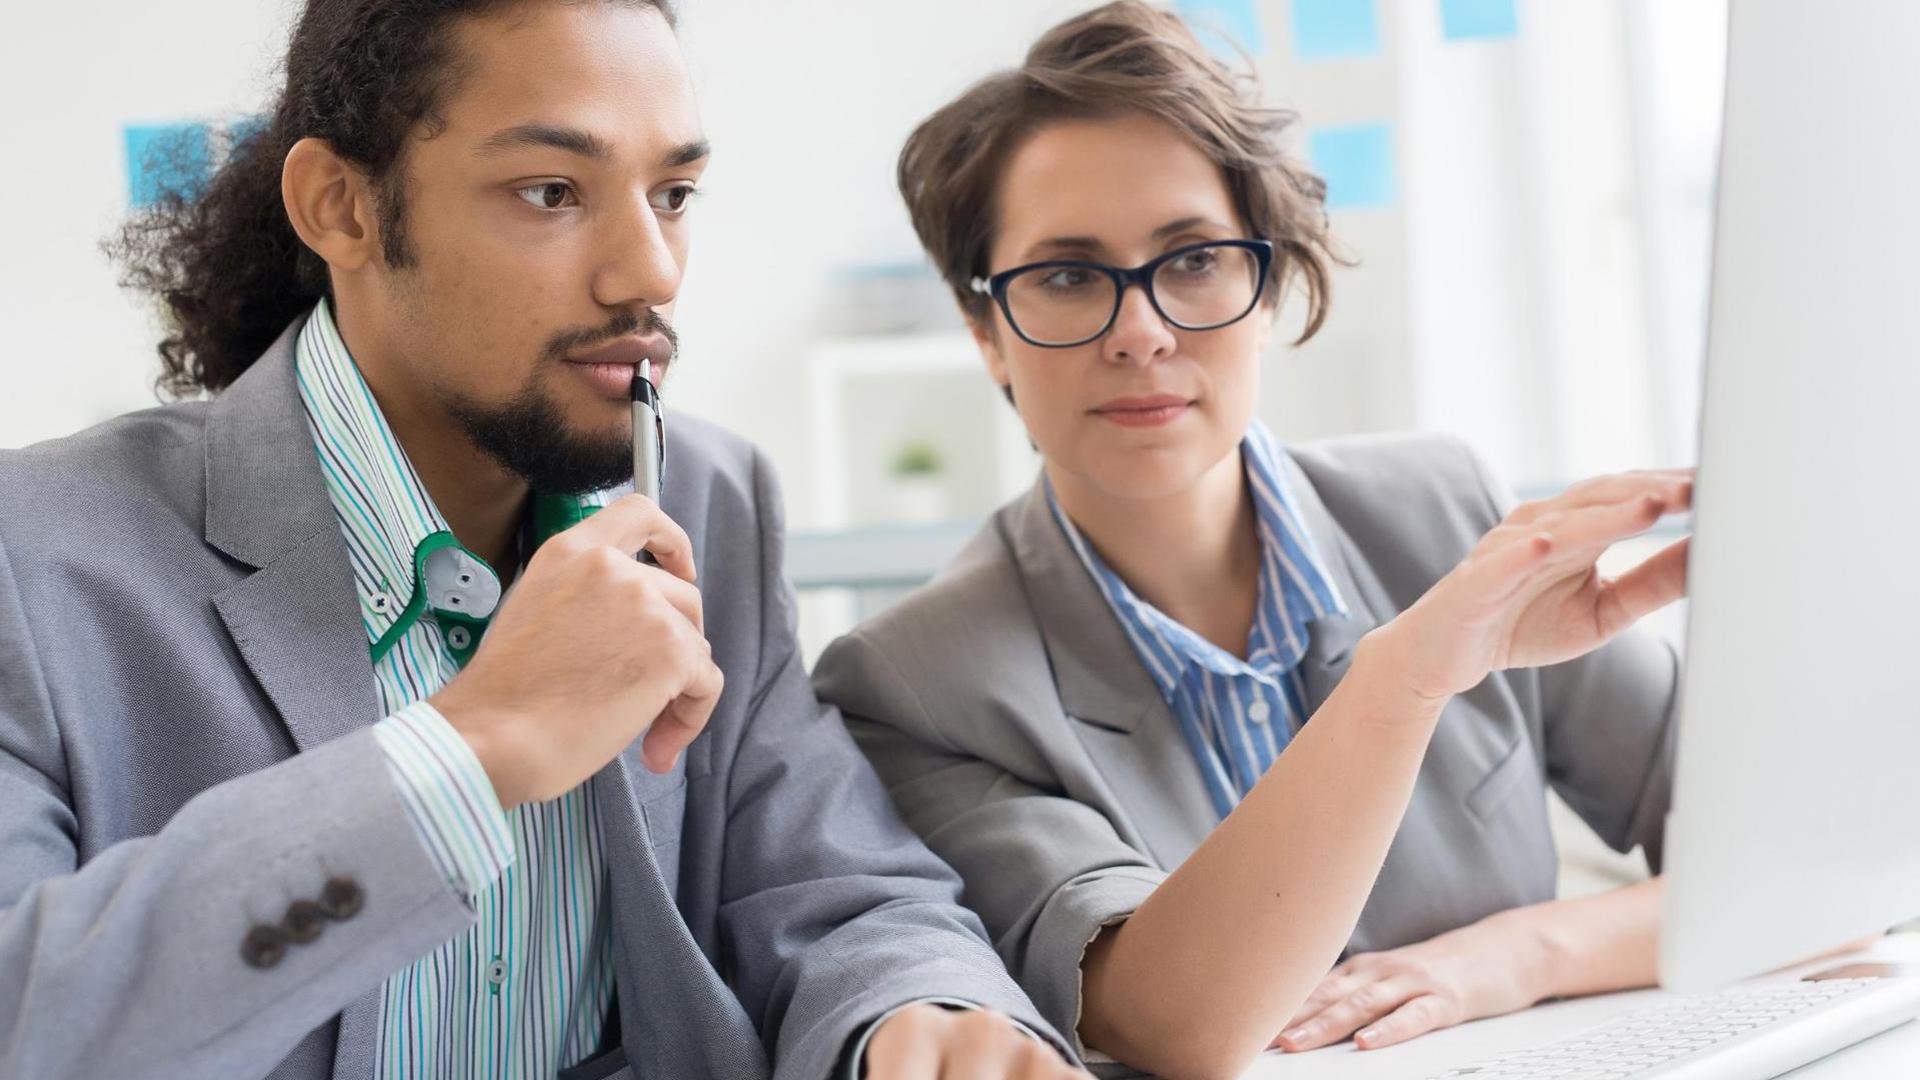 An advisor with the client